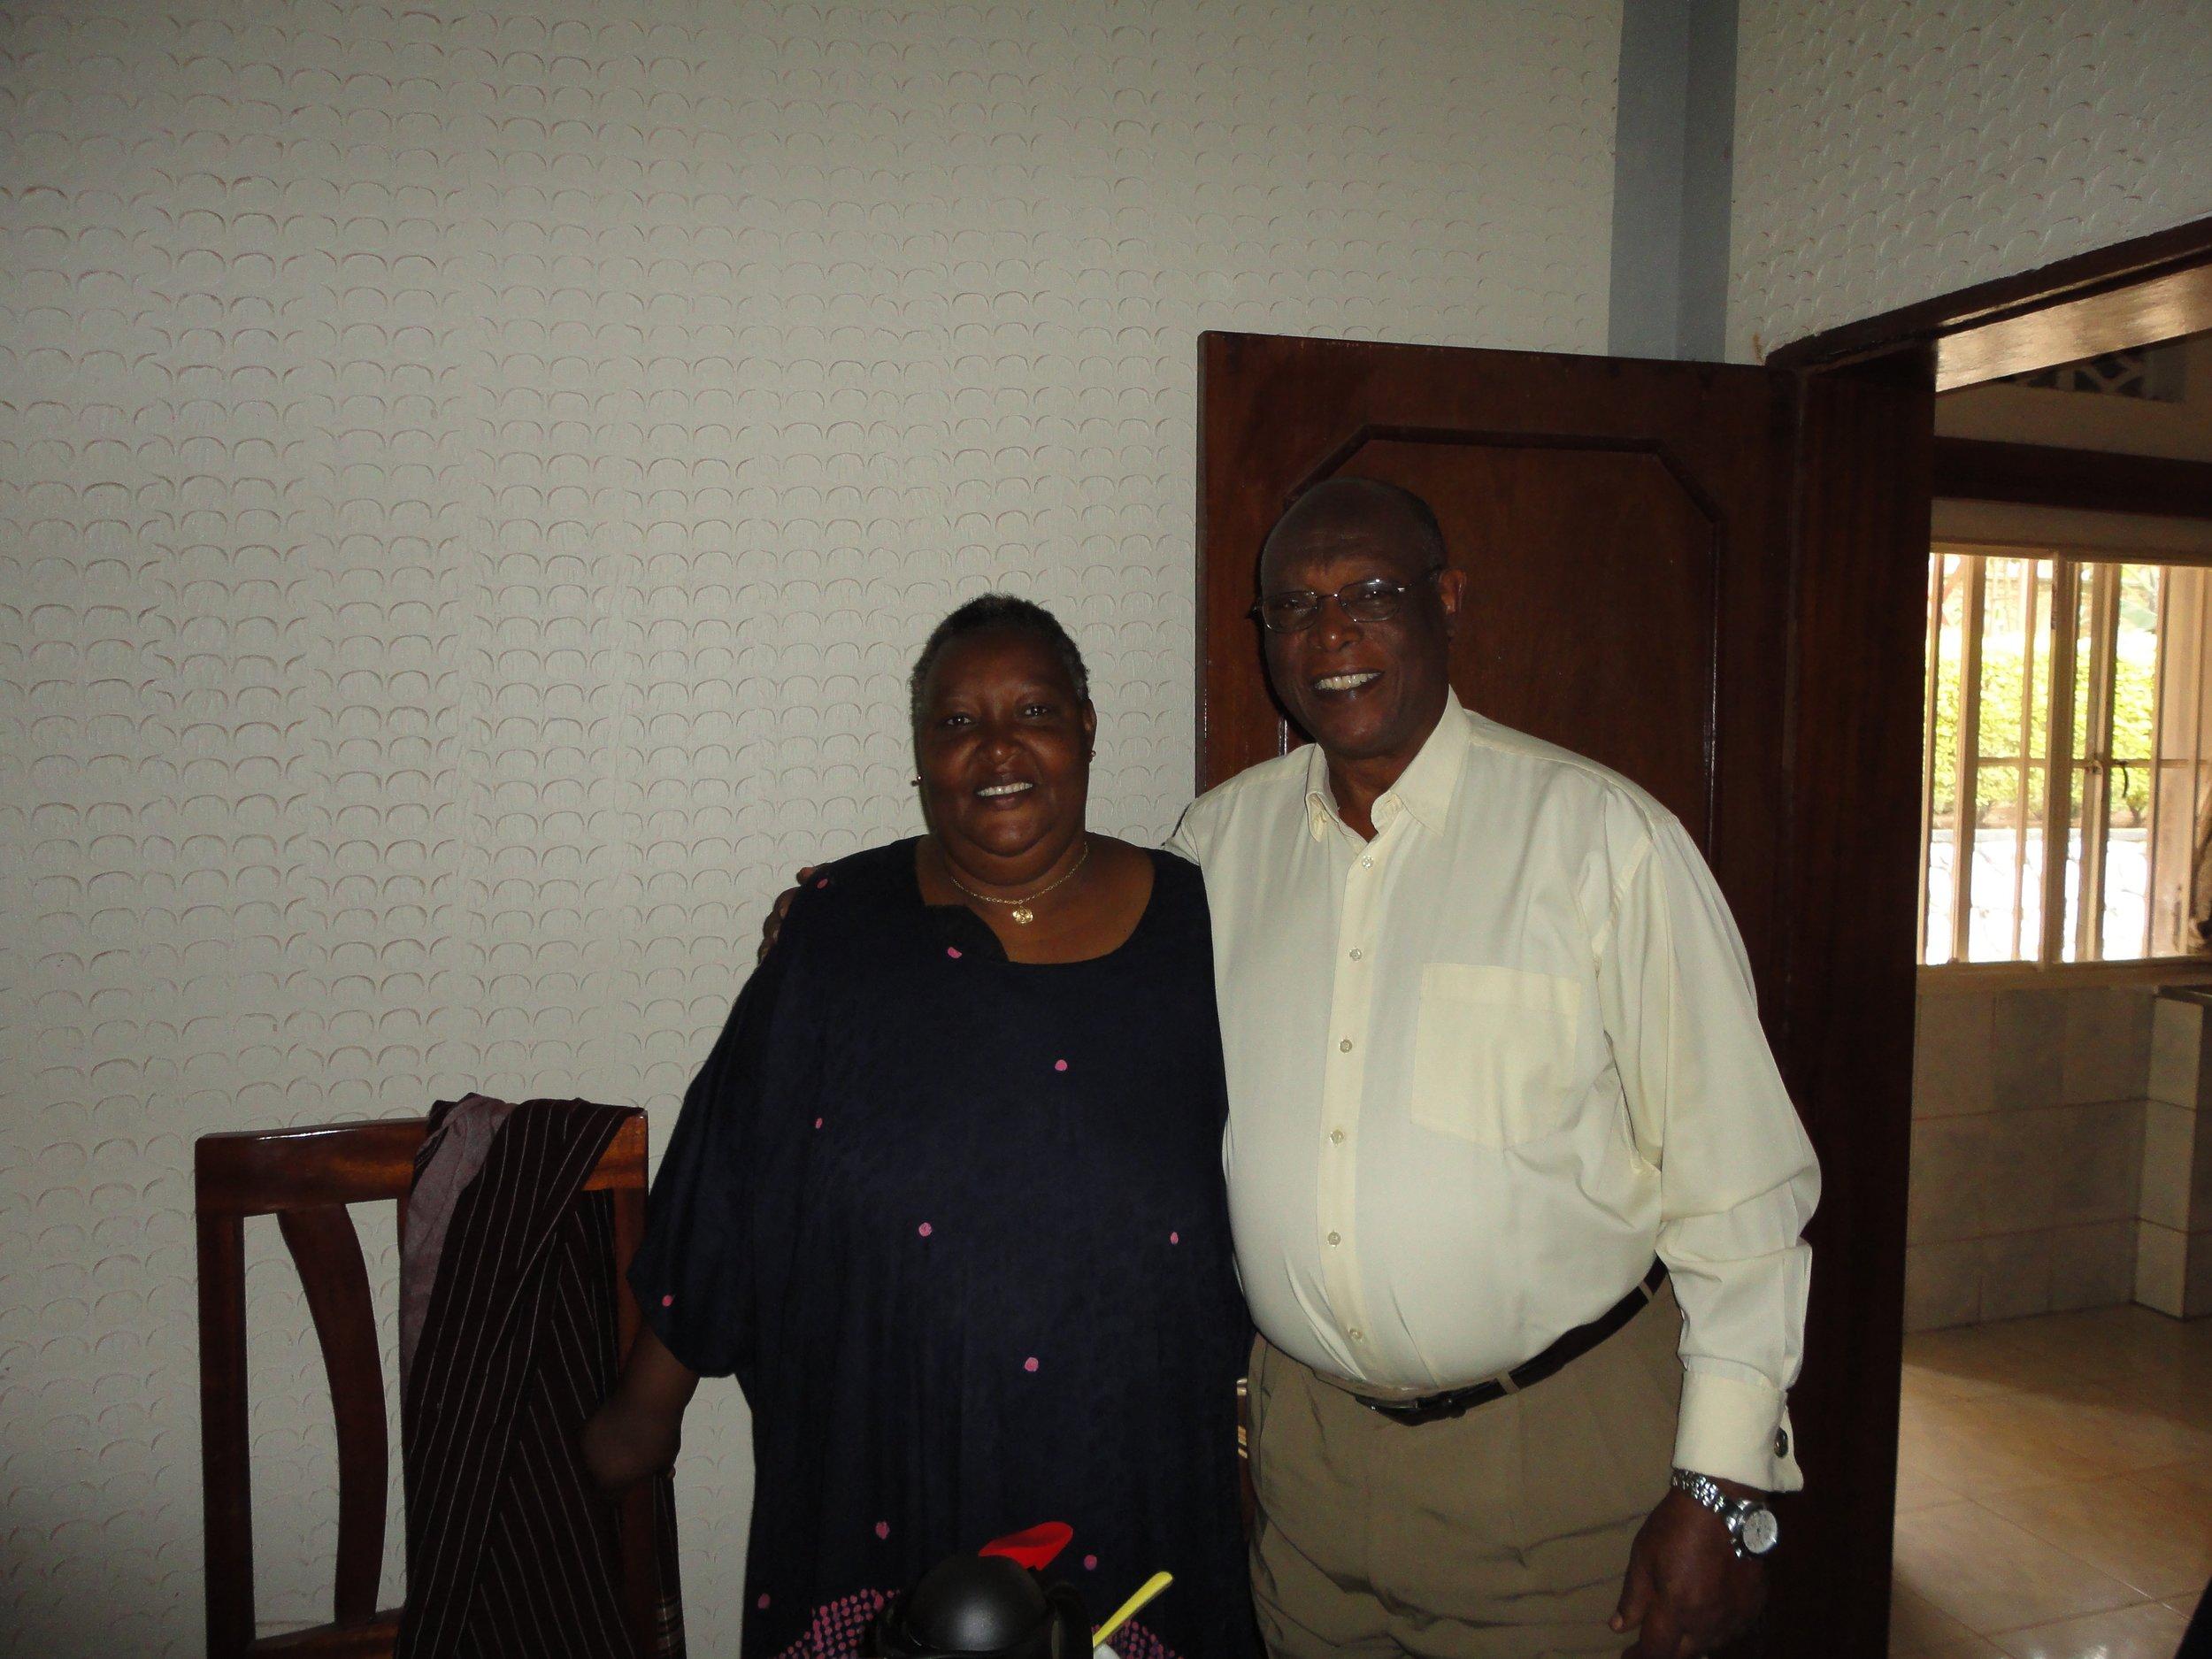 Pastor Leo Rucibigango with his wife.